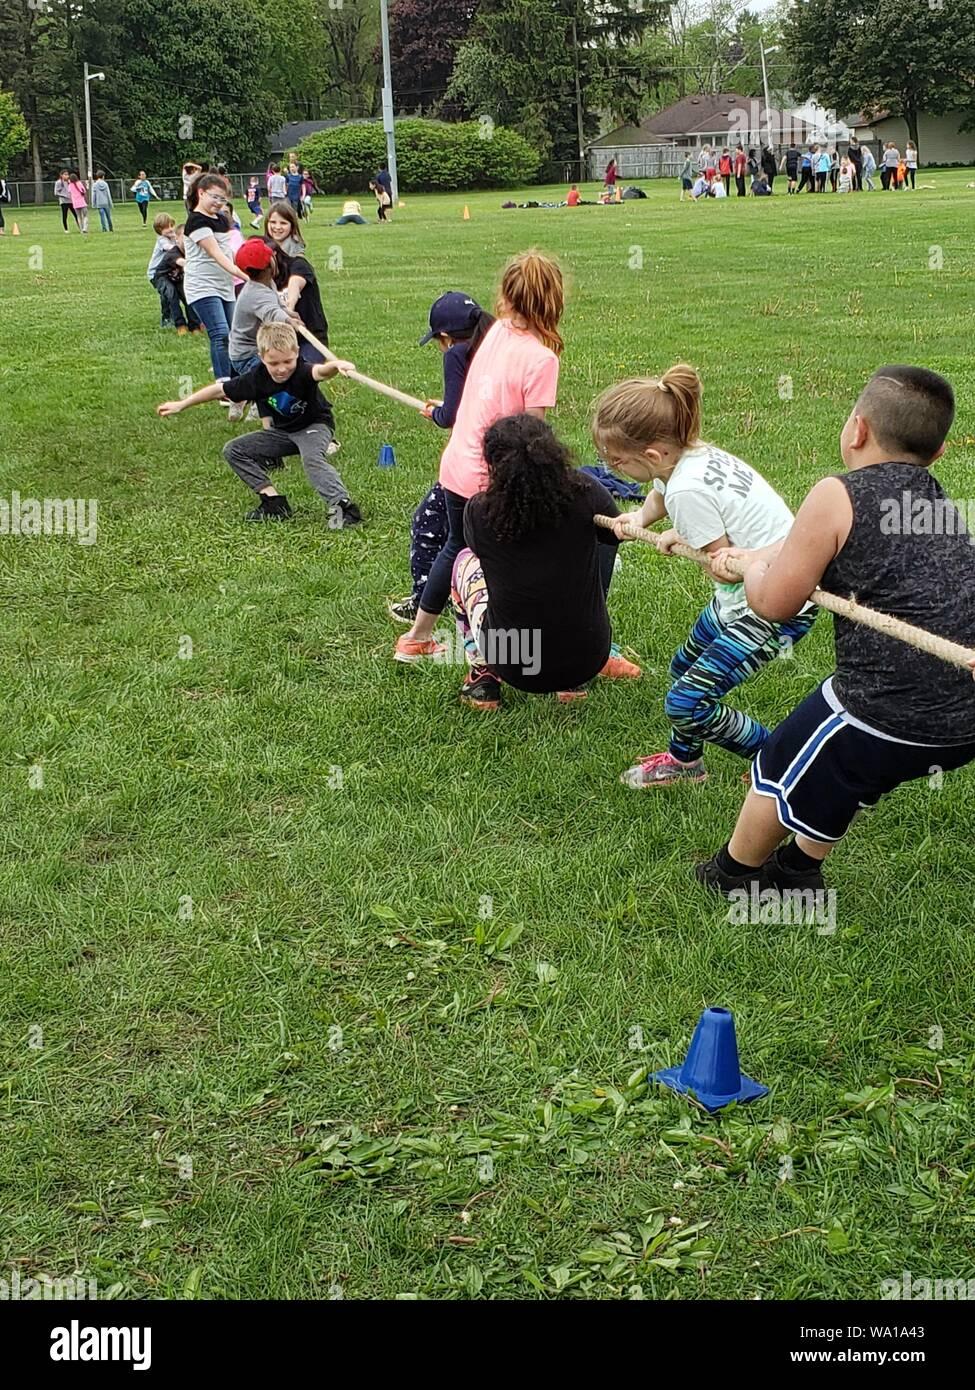 3rd grade students enjoying a fun game of tug-of-war. Stock Photo